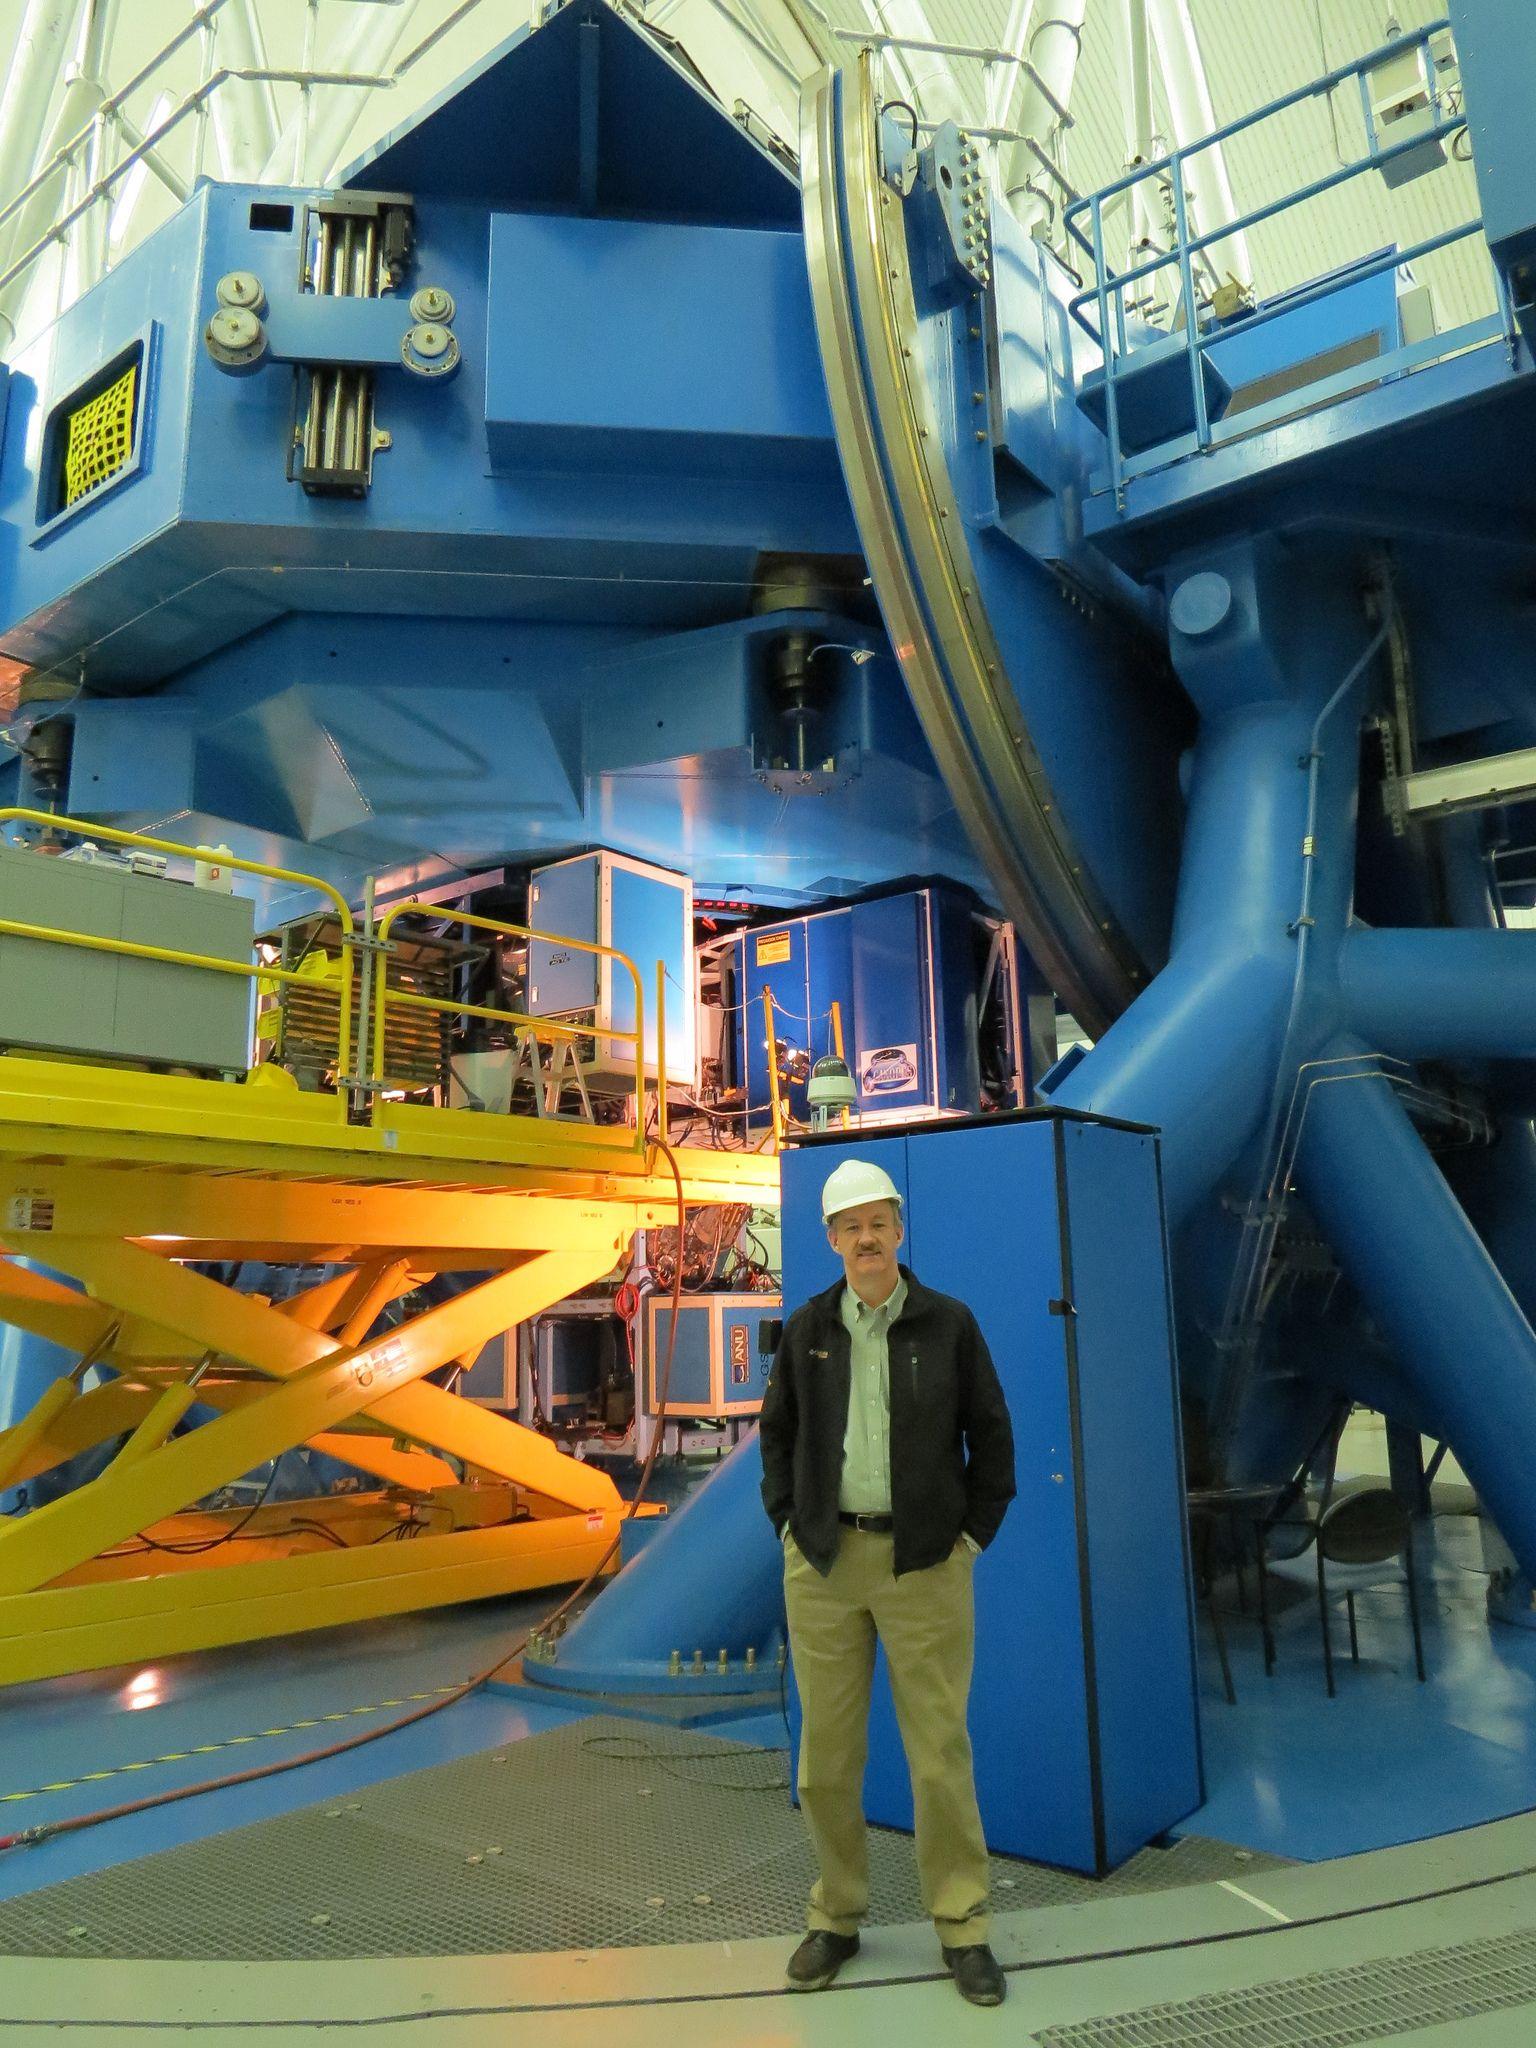 https://flic.kr/p/hnhPSn   John Bankson -  My trip to see the  Gemini Observatory on Cerro Pachón Near La Serena, Chile